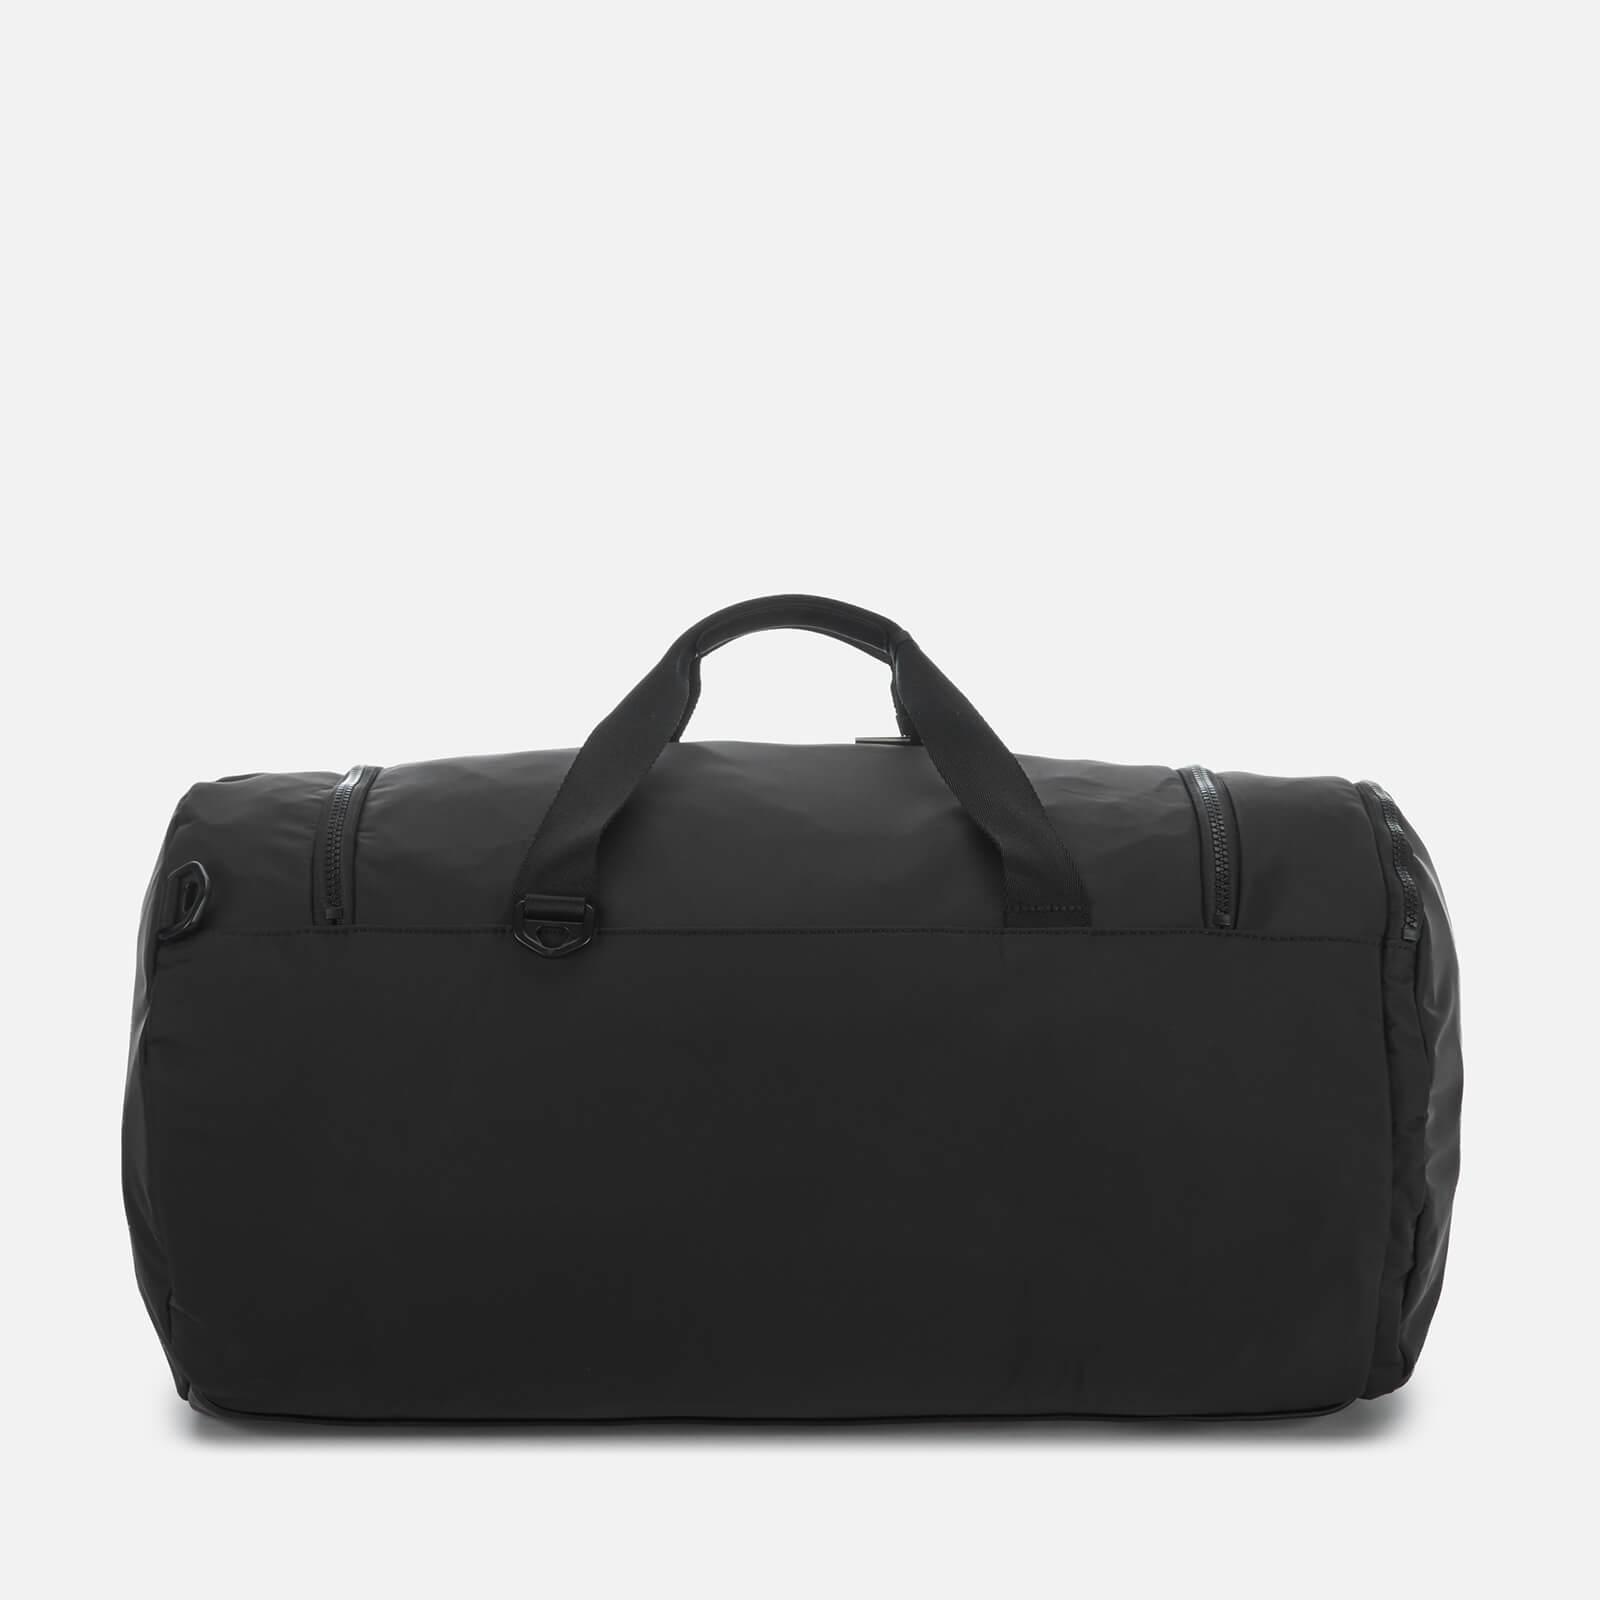 72baaec404 Tommy Hilfiger - Black Easy Nylon Holdall Bag for Men - Lyst. View  fullscreen